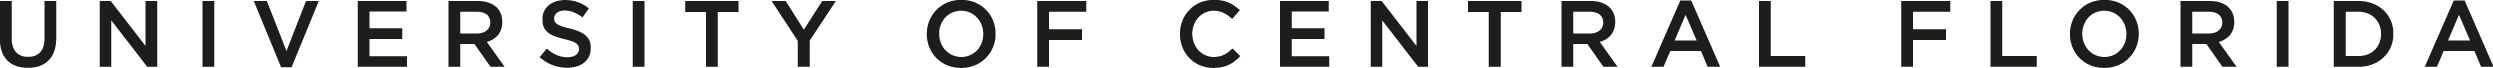 university-of_central_florida-logo